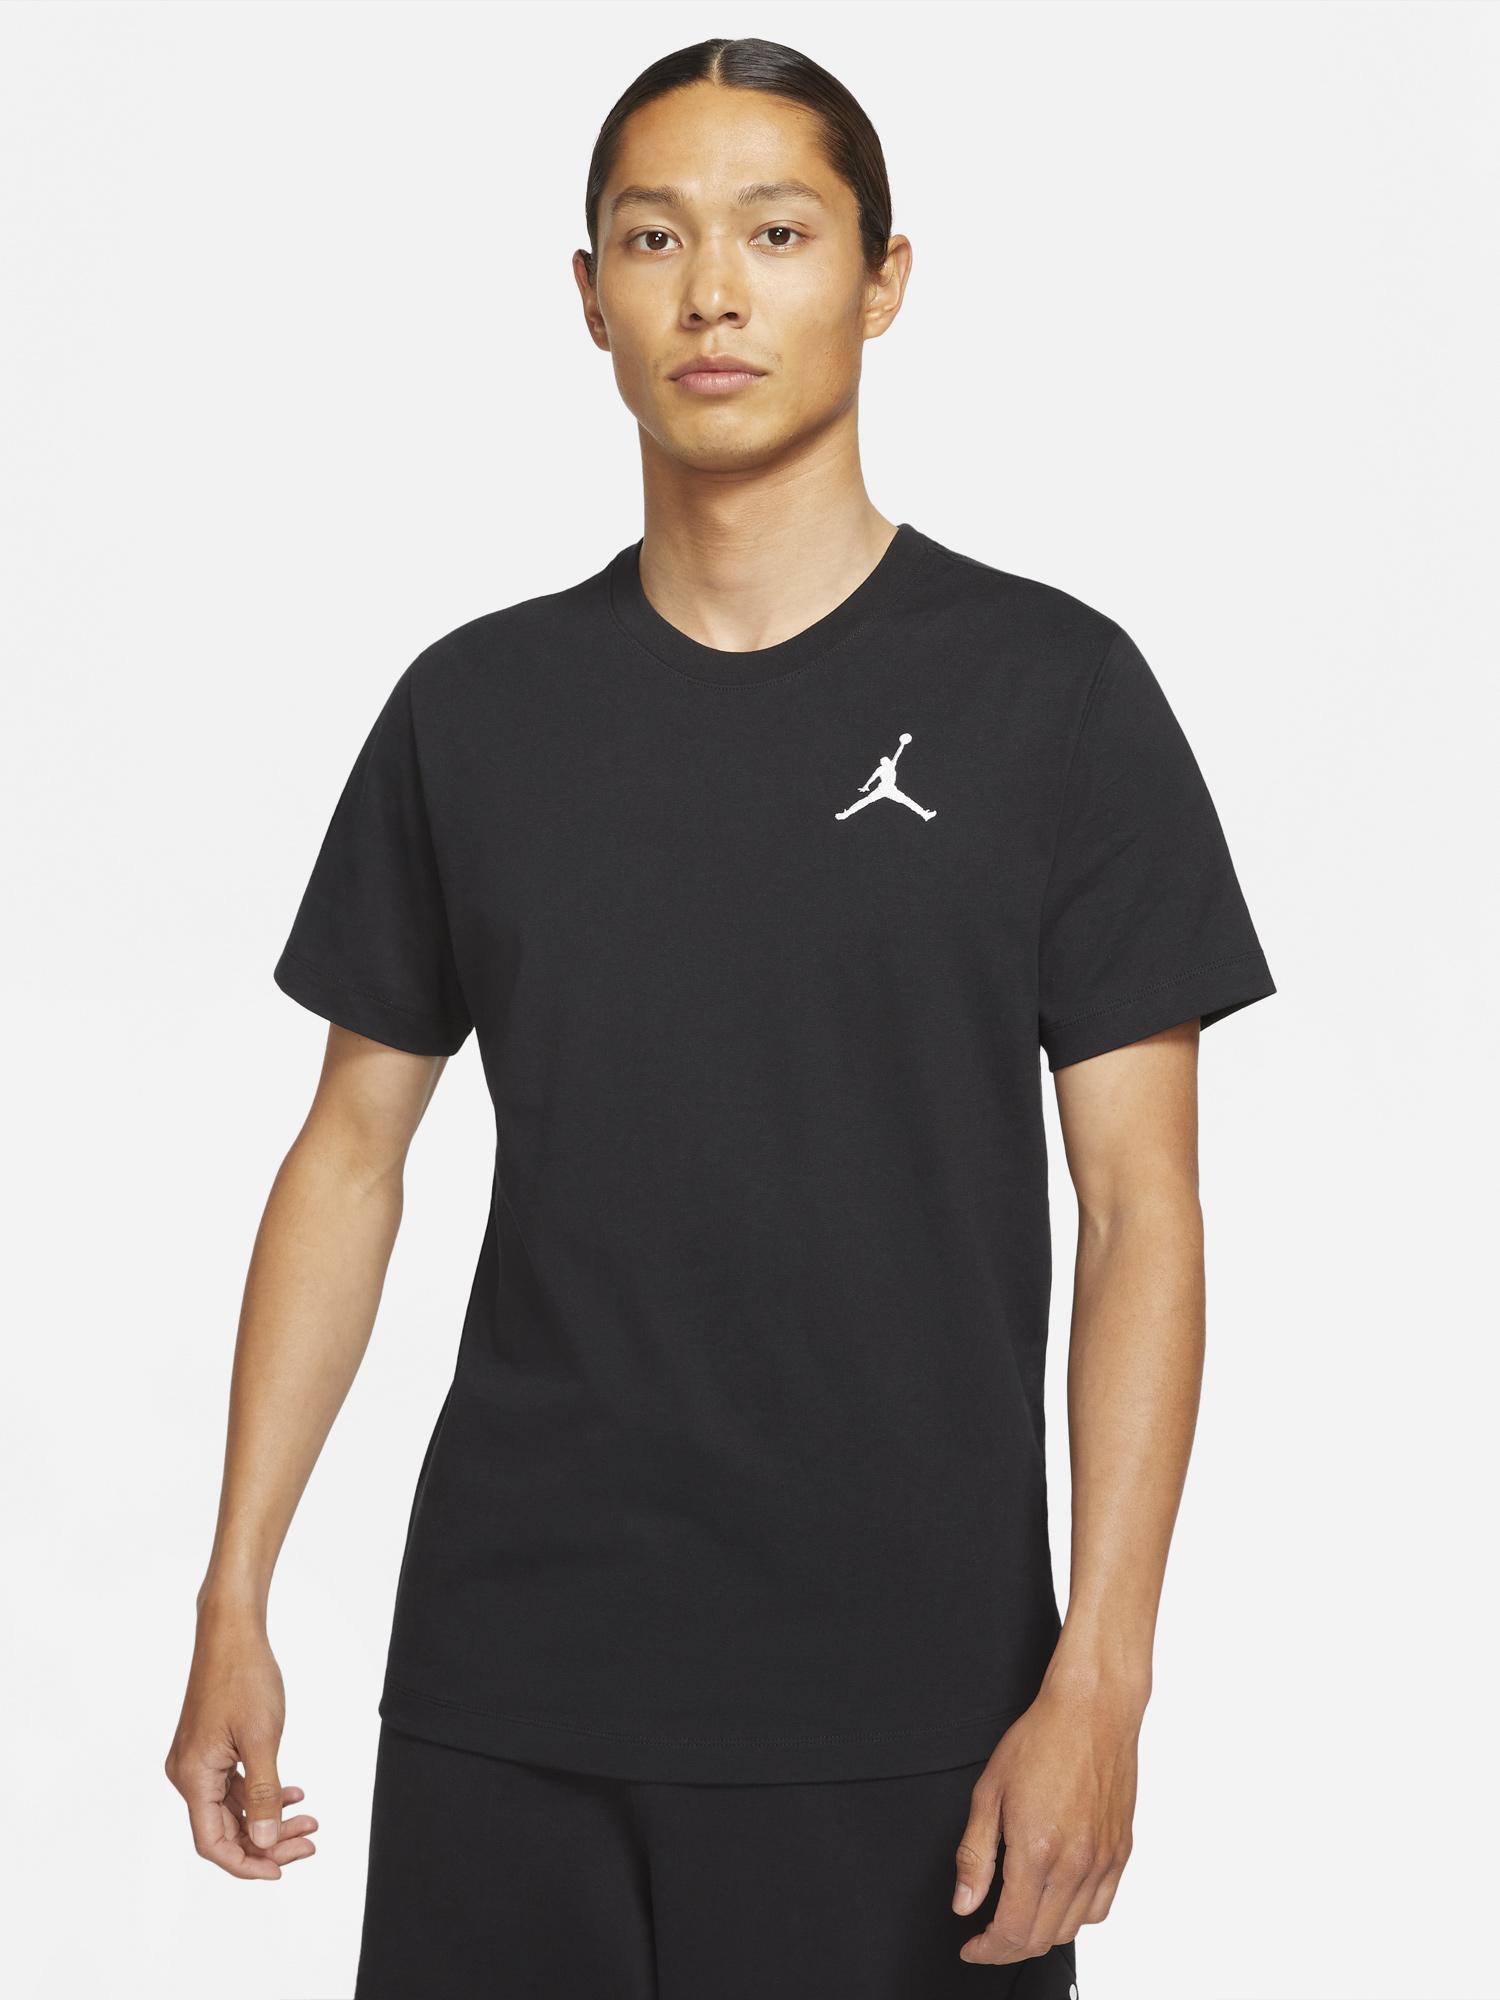 jordan-black-white-jumpman-embroidered-t-shirt-1